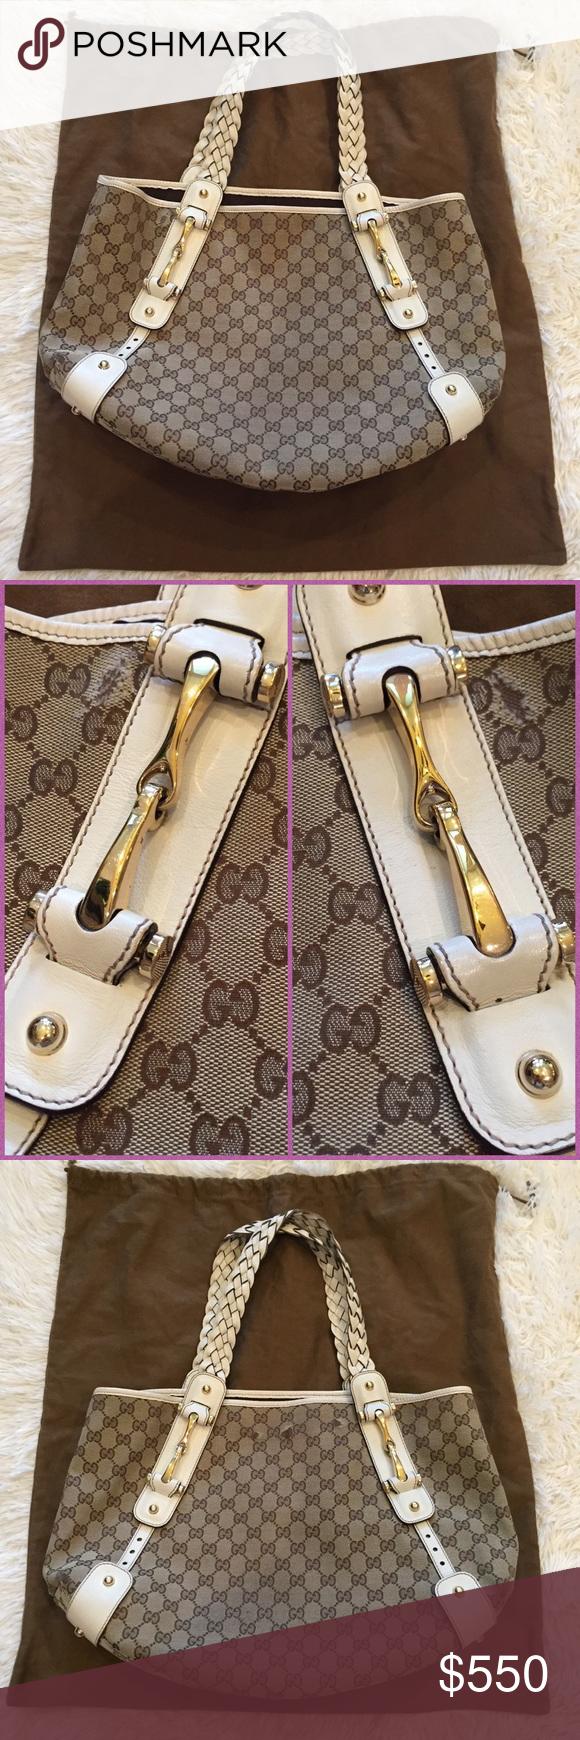 fc1e1944665dd9 Gucci Monogram Medium Pelham Shoulder Bag Gucci Medium Pelham shoulder bag  in brown/tan GG